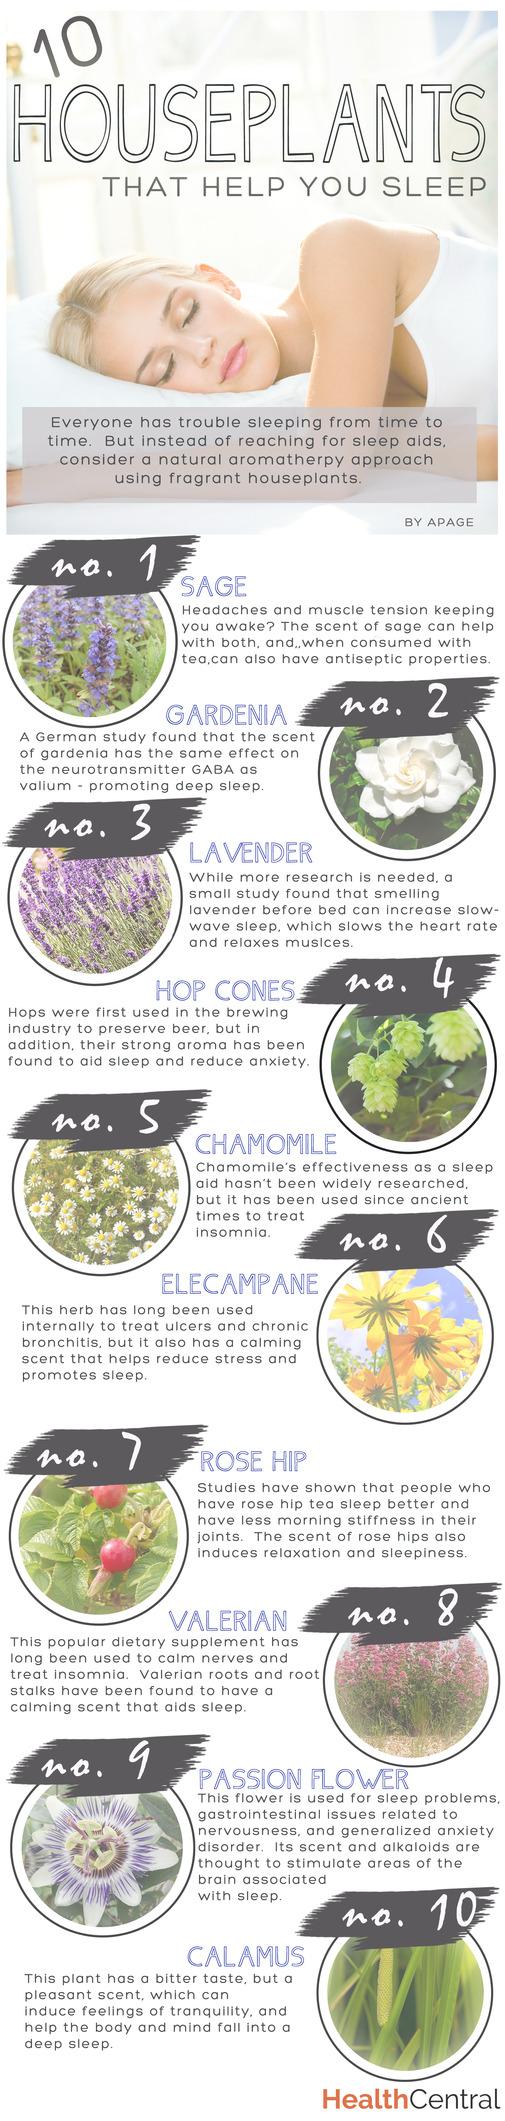 10 Houseplants For Getting Better Sleep Infographic